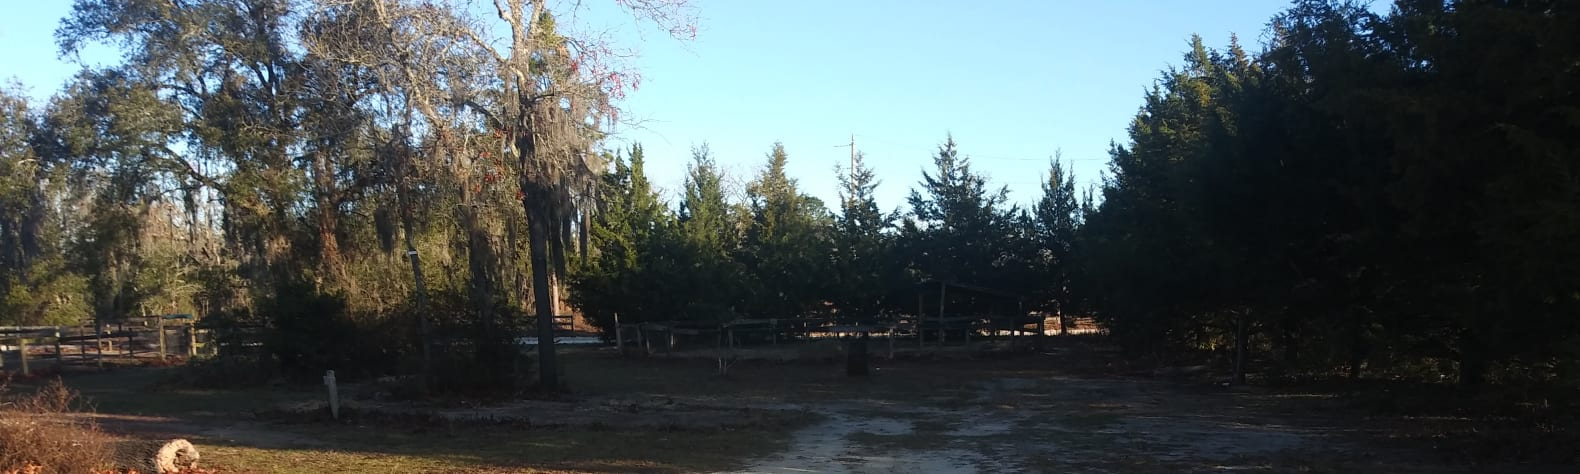 Margret B.'s Land